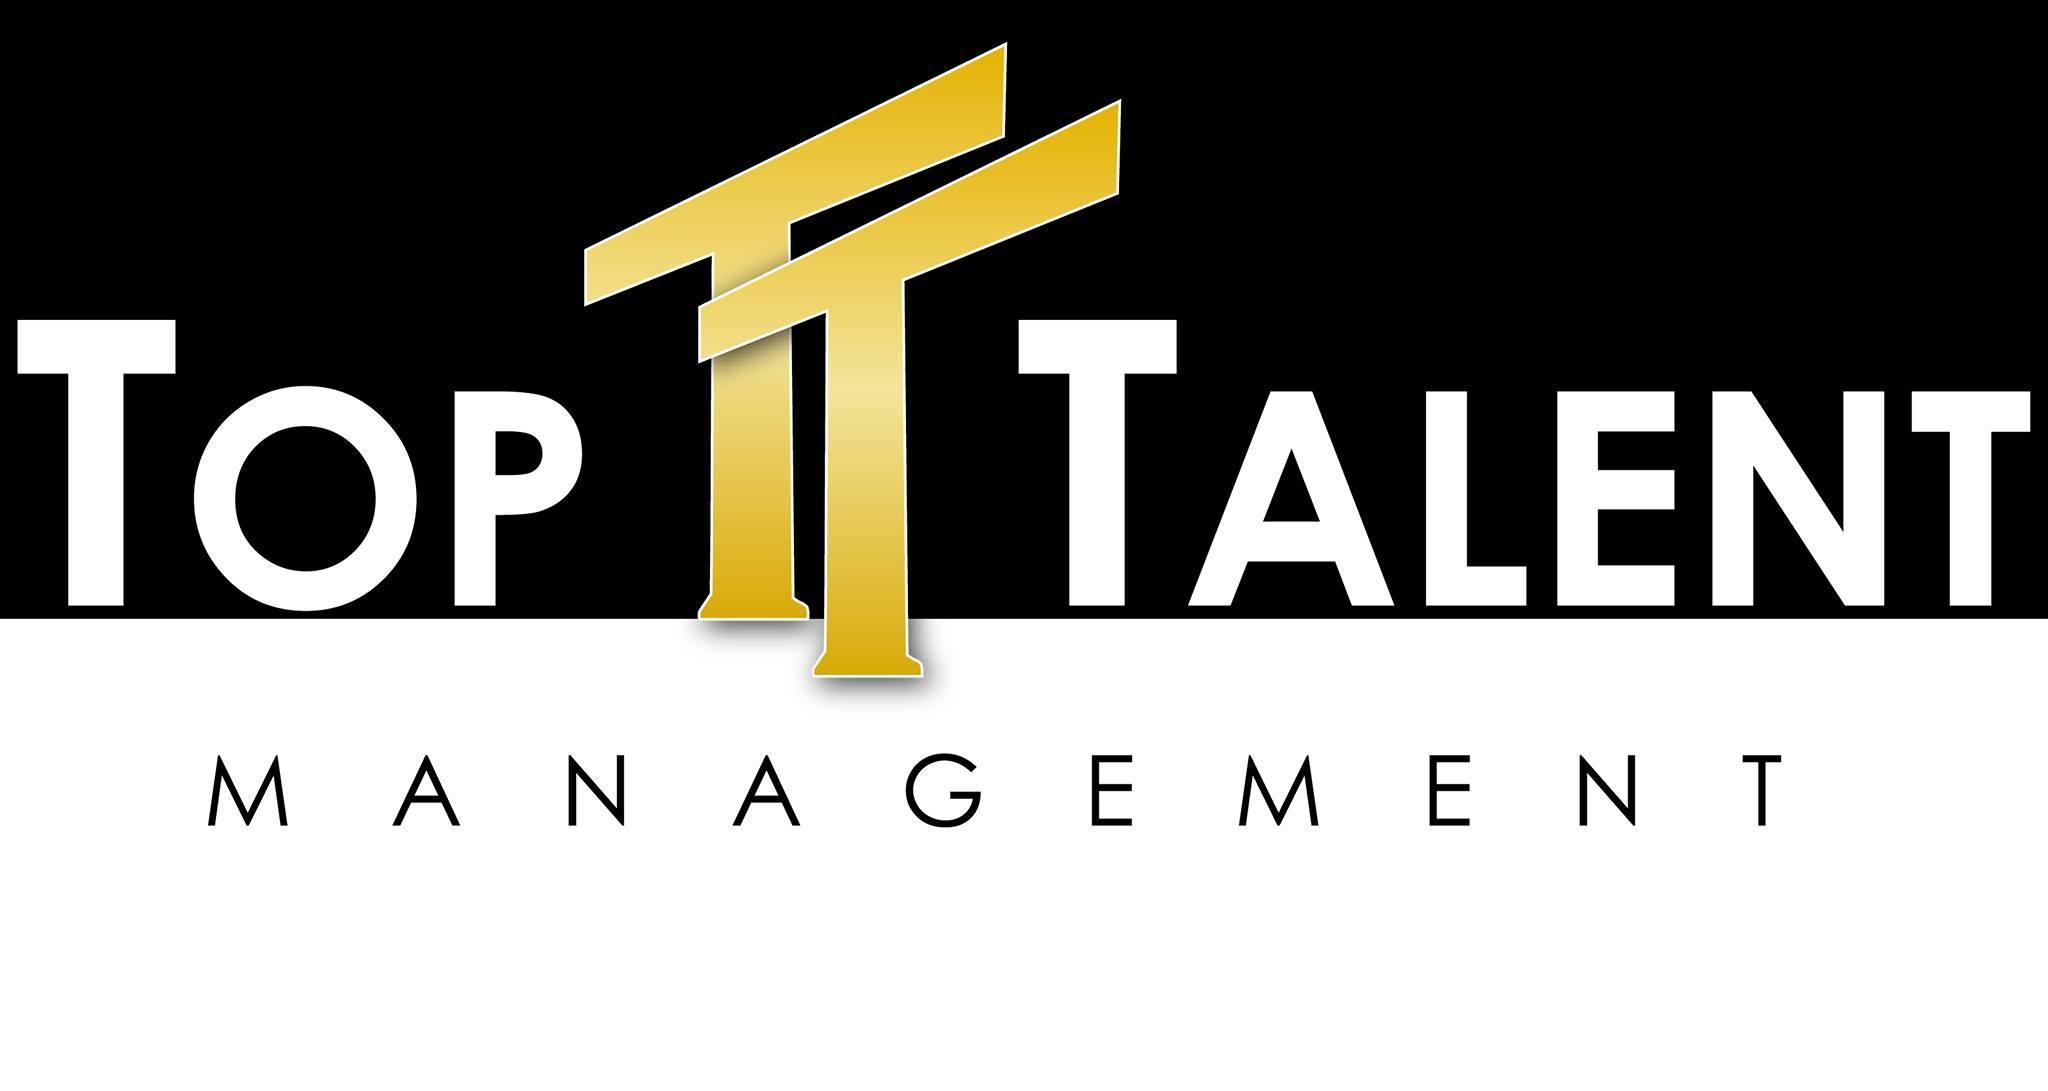 Top Talent Management logo